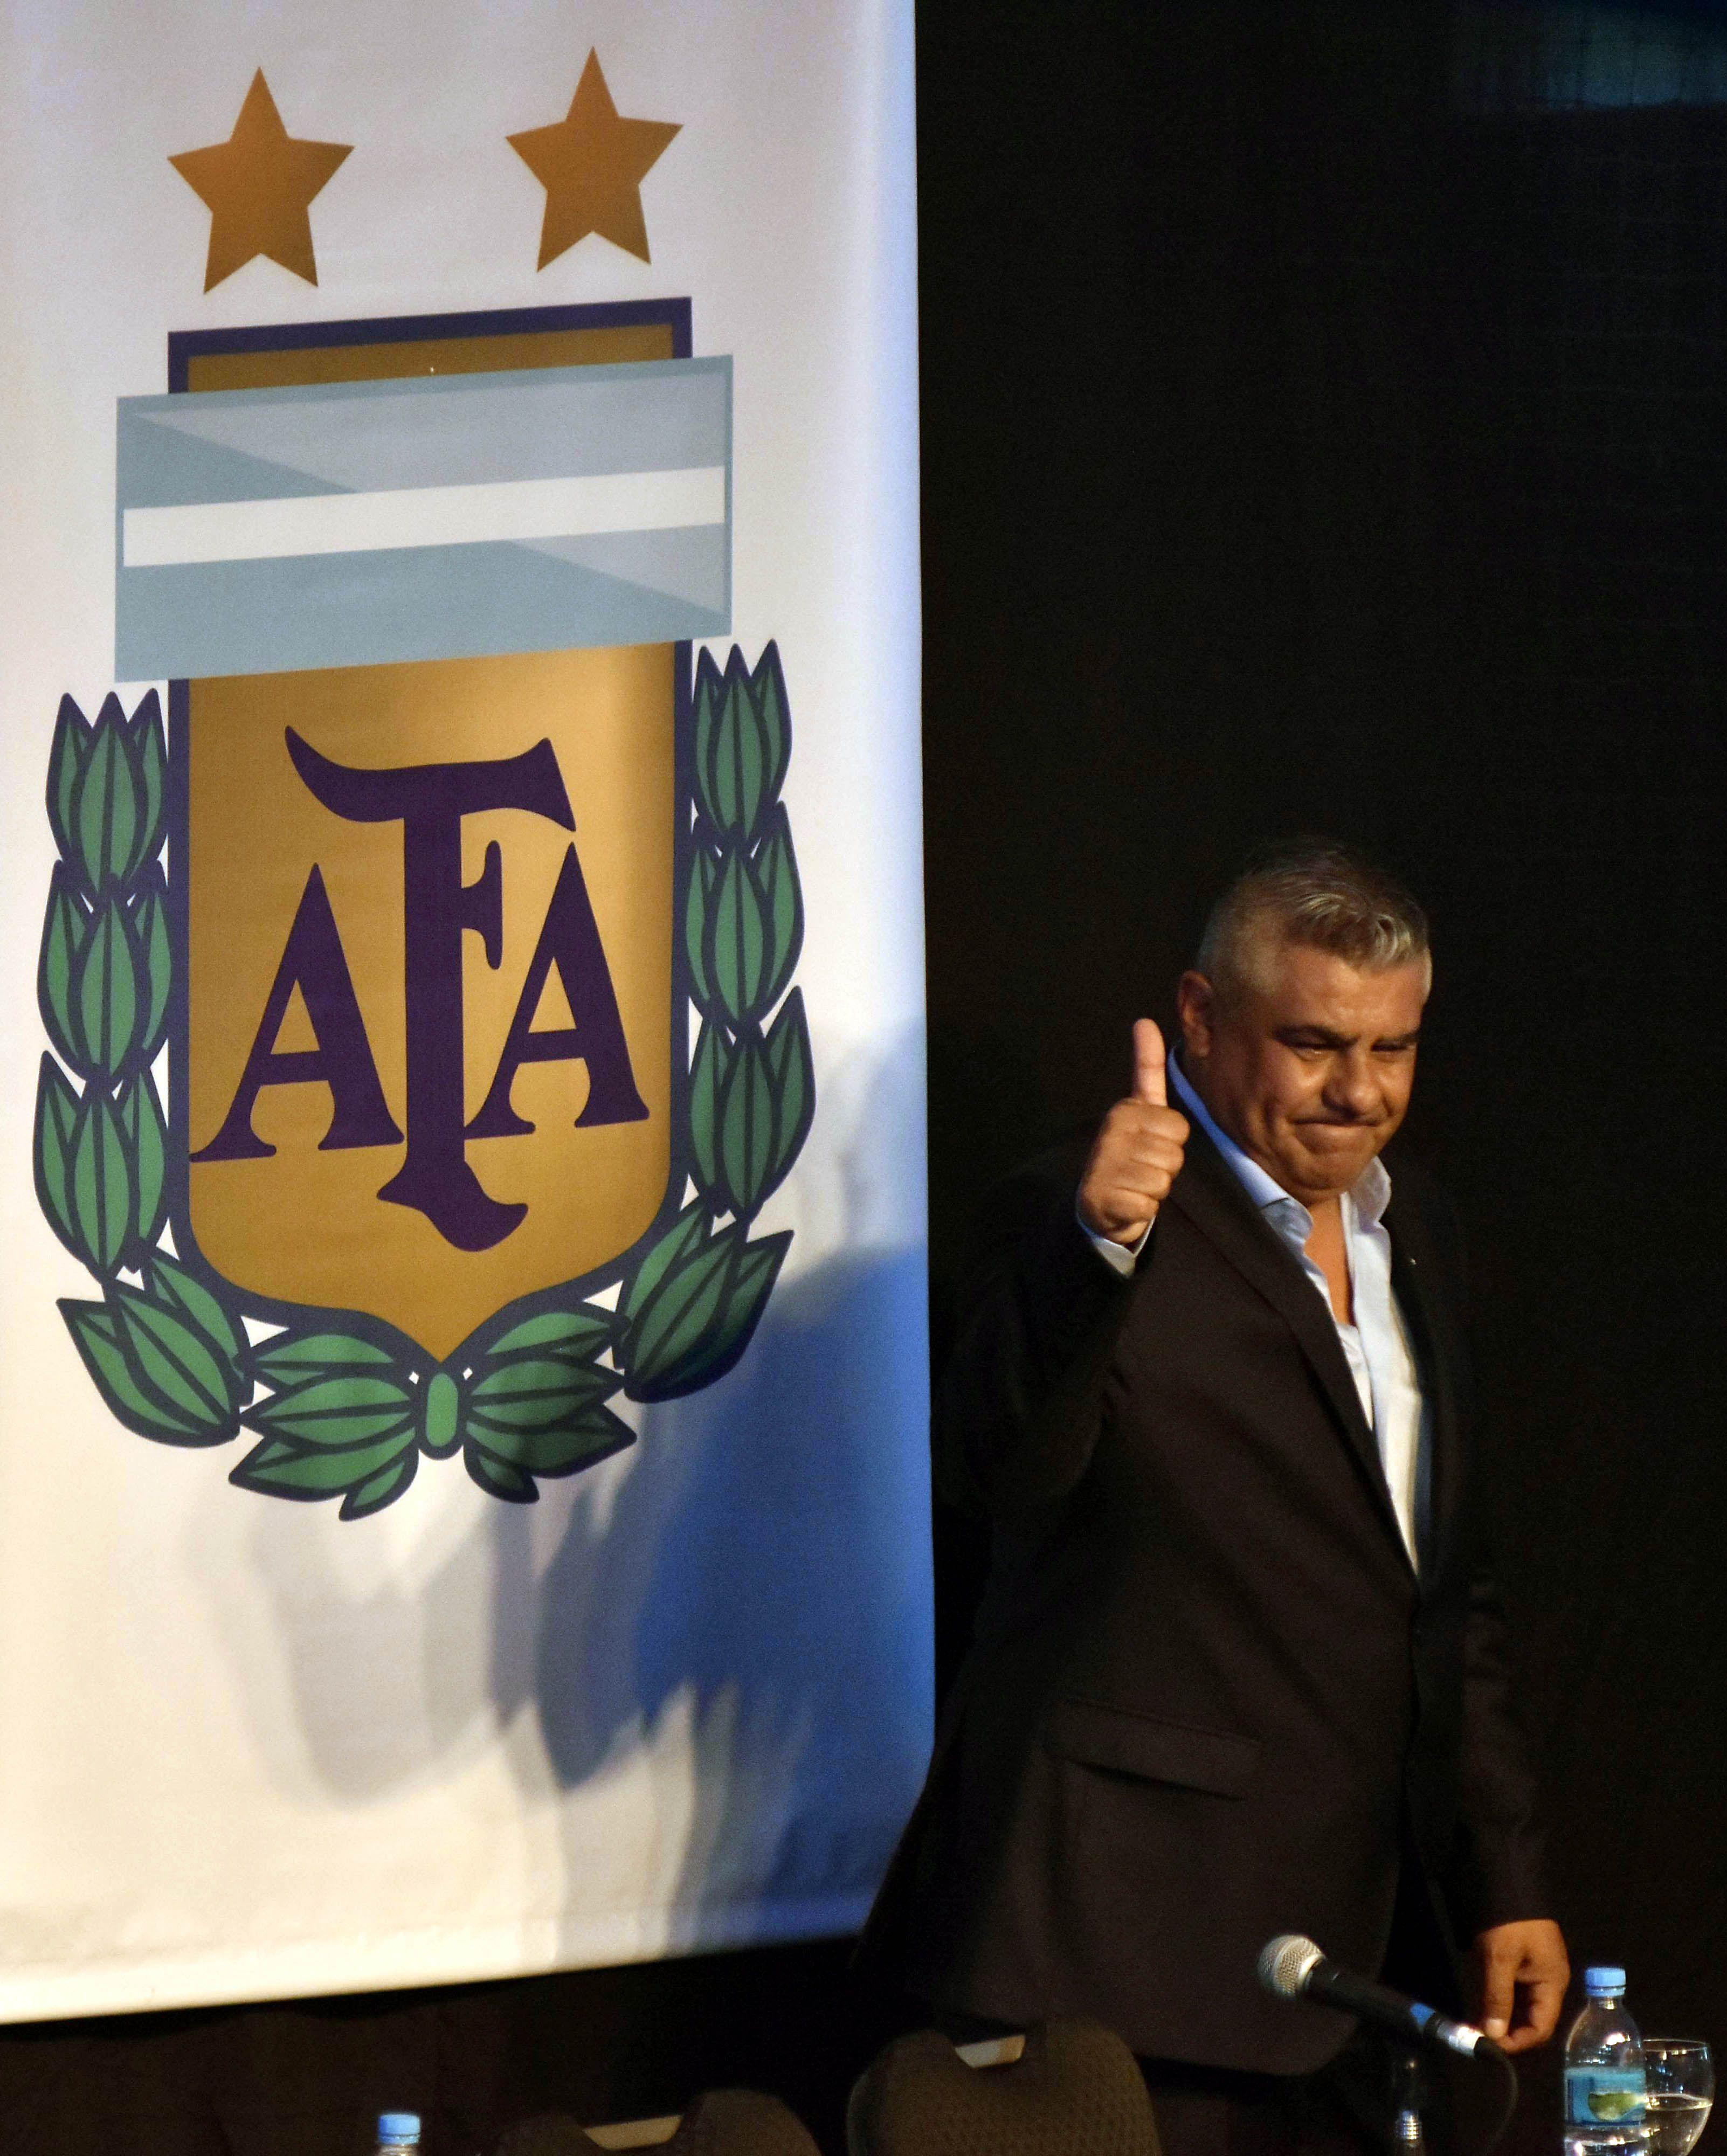 Chiqui Tapia asumió la presidencia de la AFA